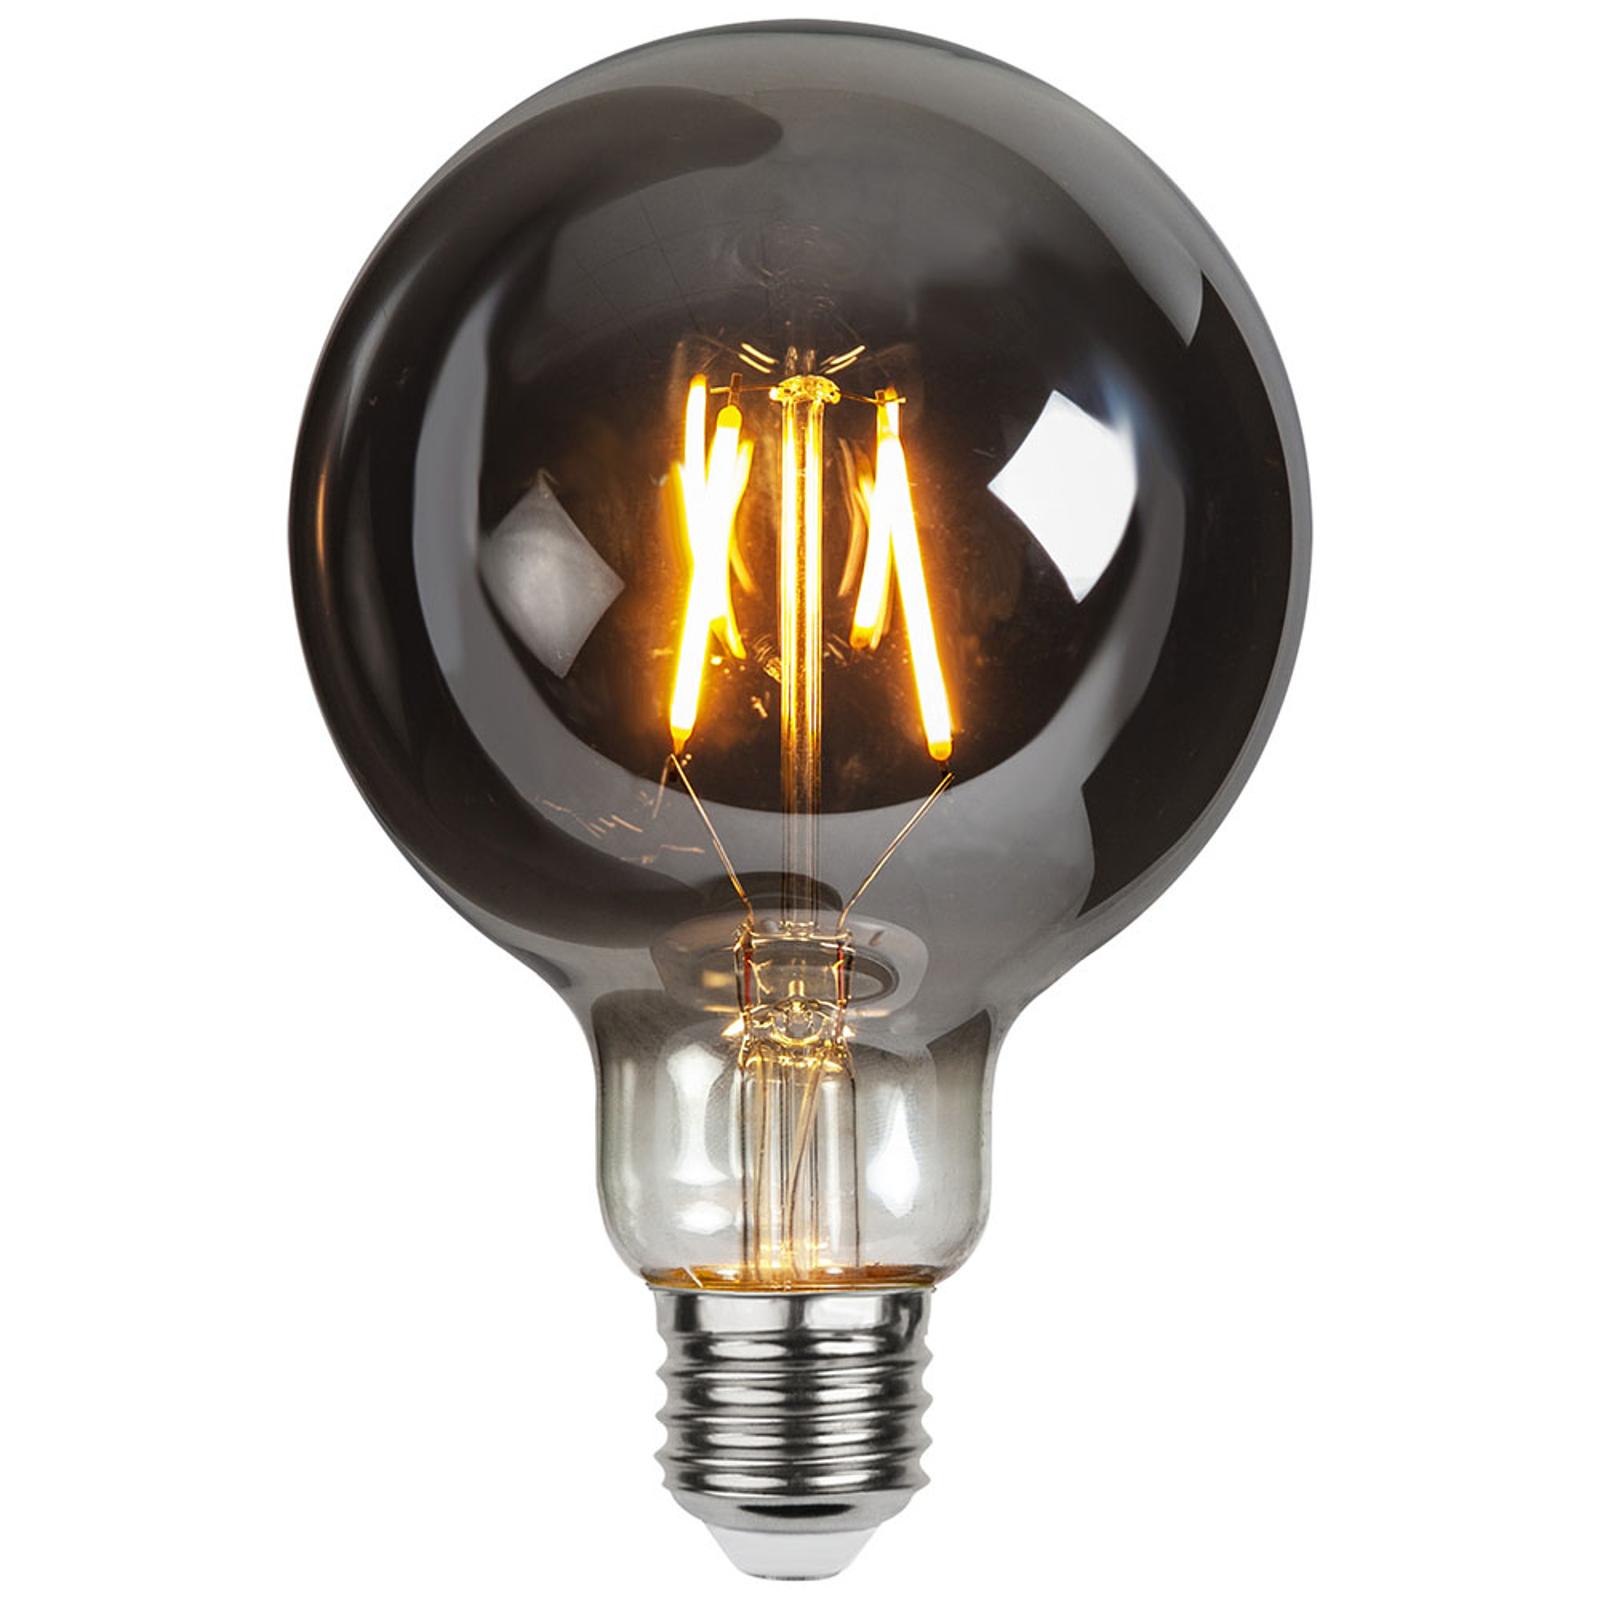 LED-Globelampe E27 1,8W Plain Smoke 2.100K Ø 95mm